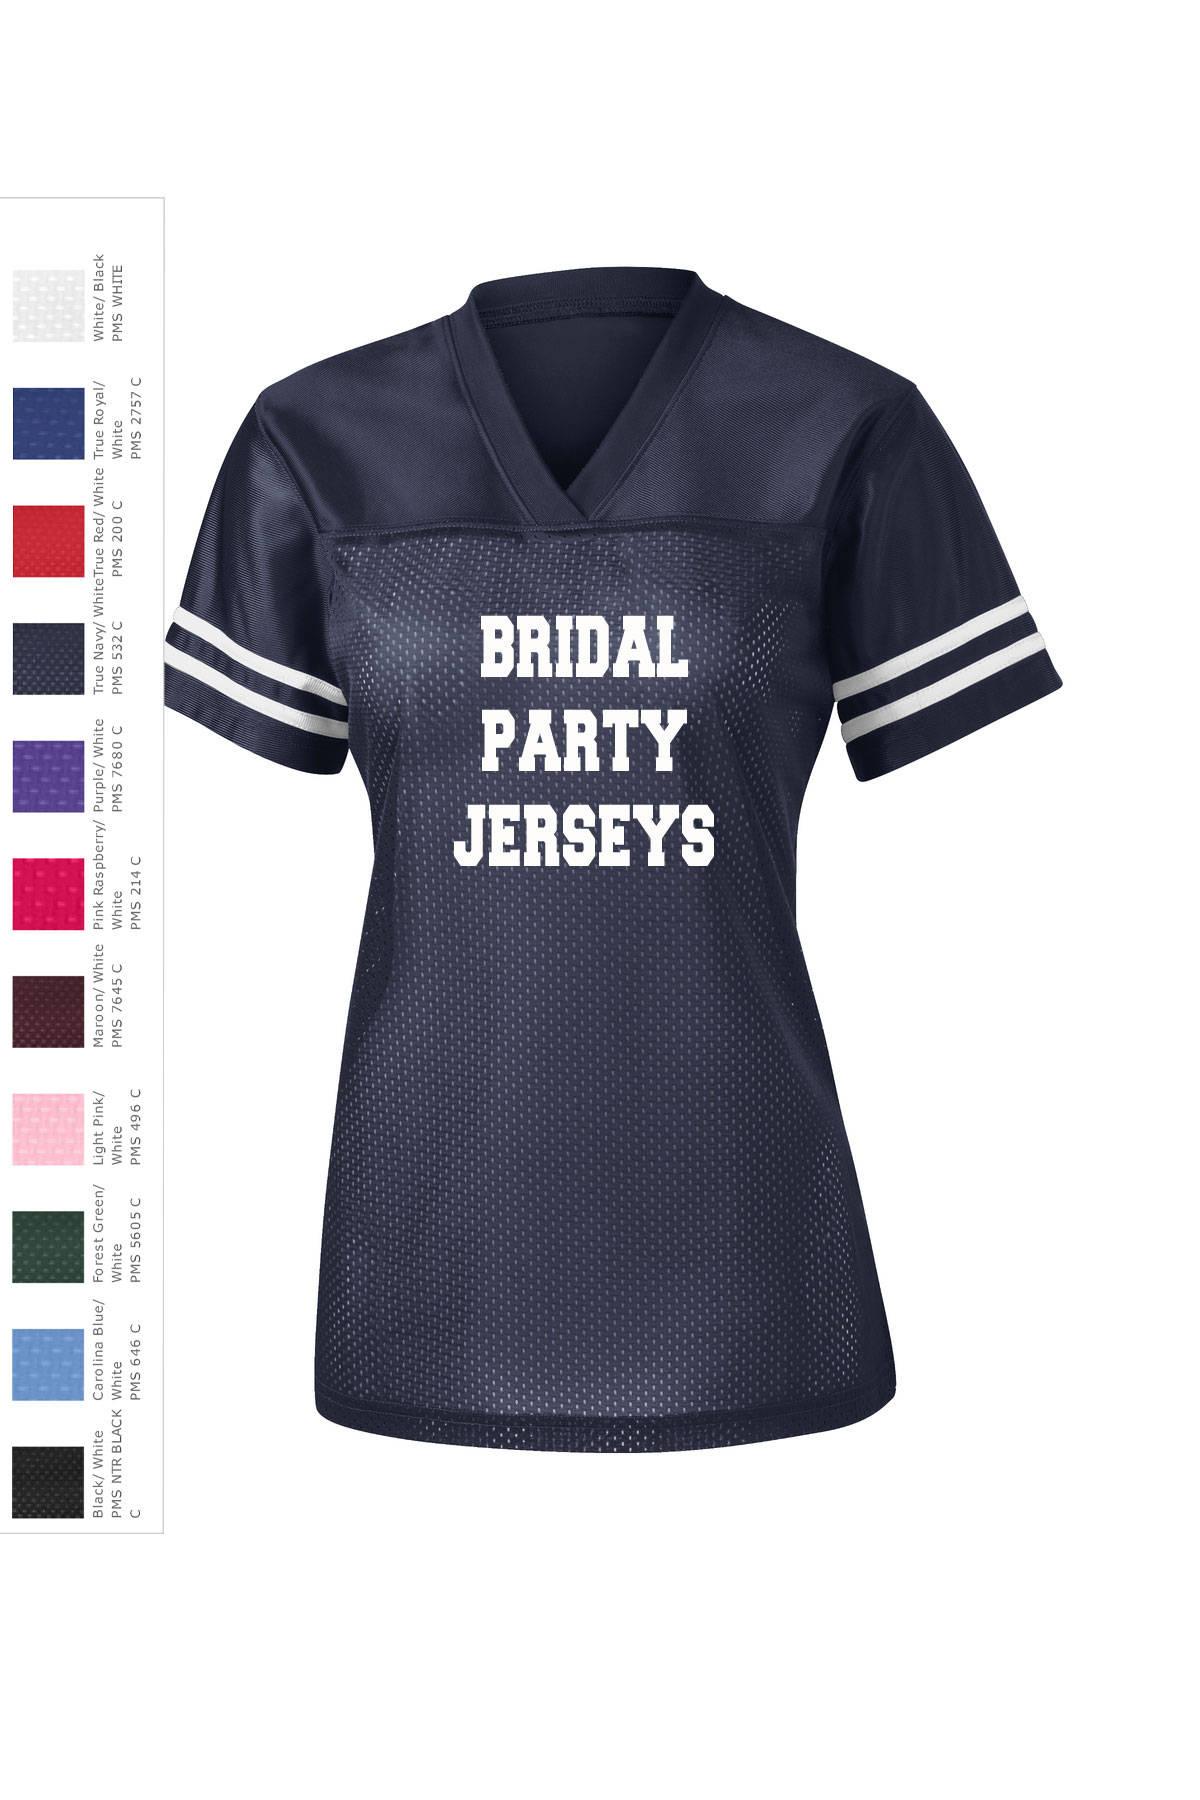 ee7876cba Bridal Party Jerseys Sport-tek Ladies PosiCharge Replica | Etsy